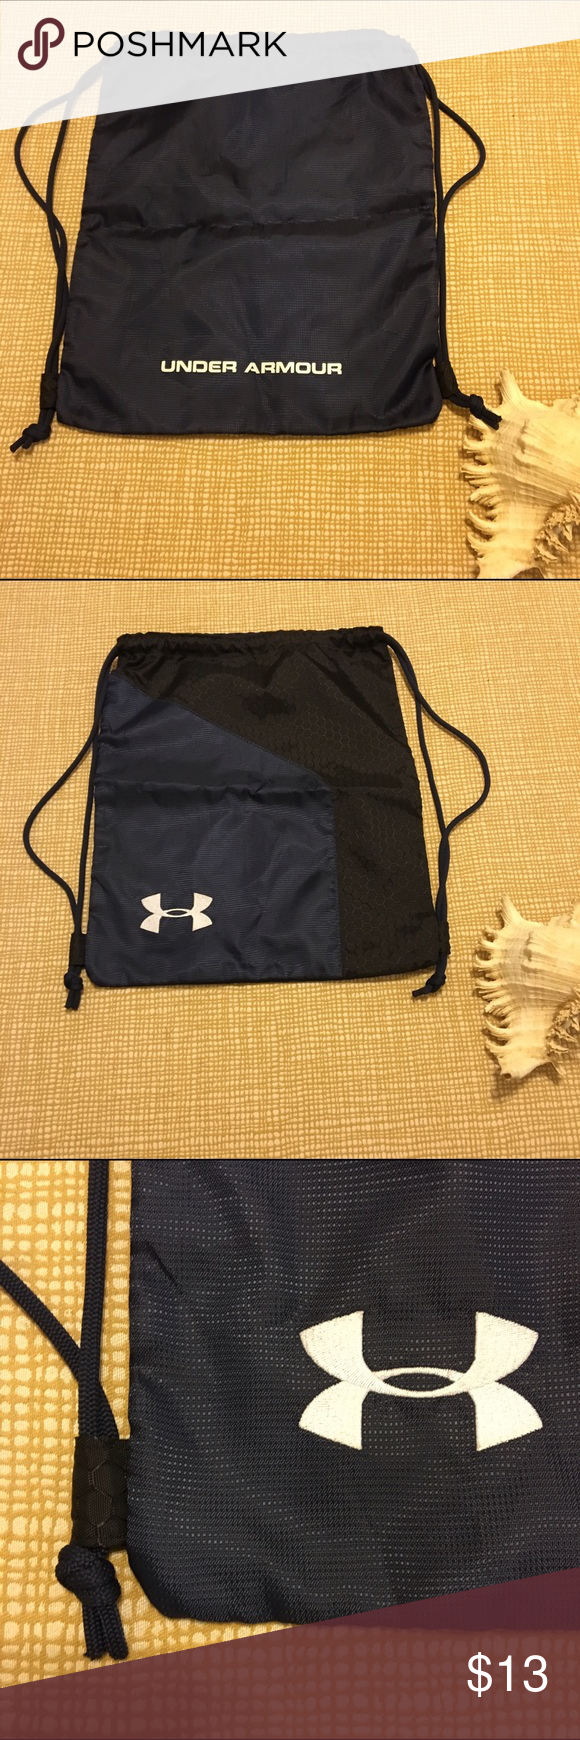 Under Armour drawstring navy blue bag. Under Armour drawstring navy blue bag.  Previously used. Under Armour Bags Backpacks c07941f7e7